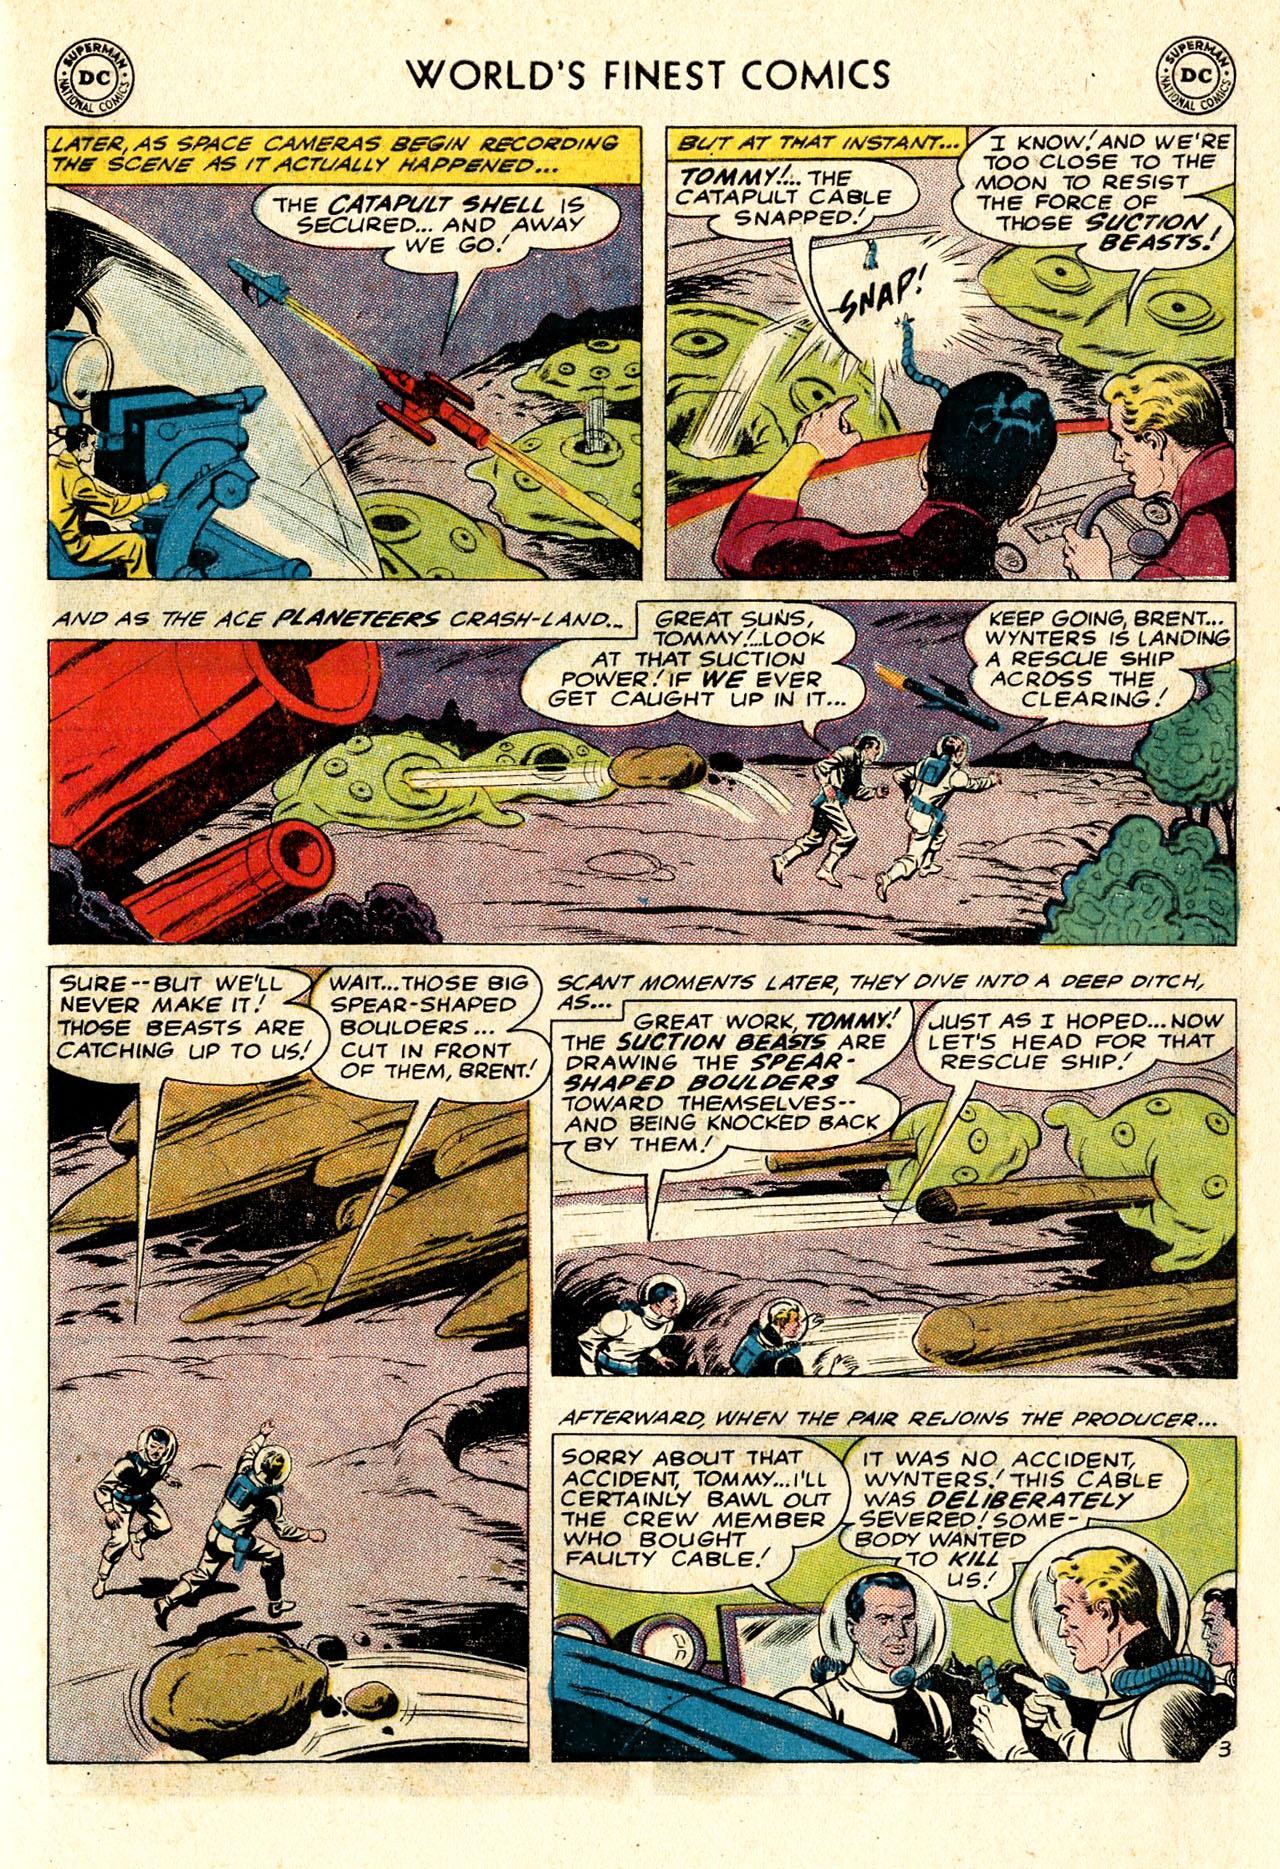 Read online World's Finest Comics comic -  Issue #107 - 21